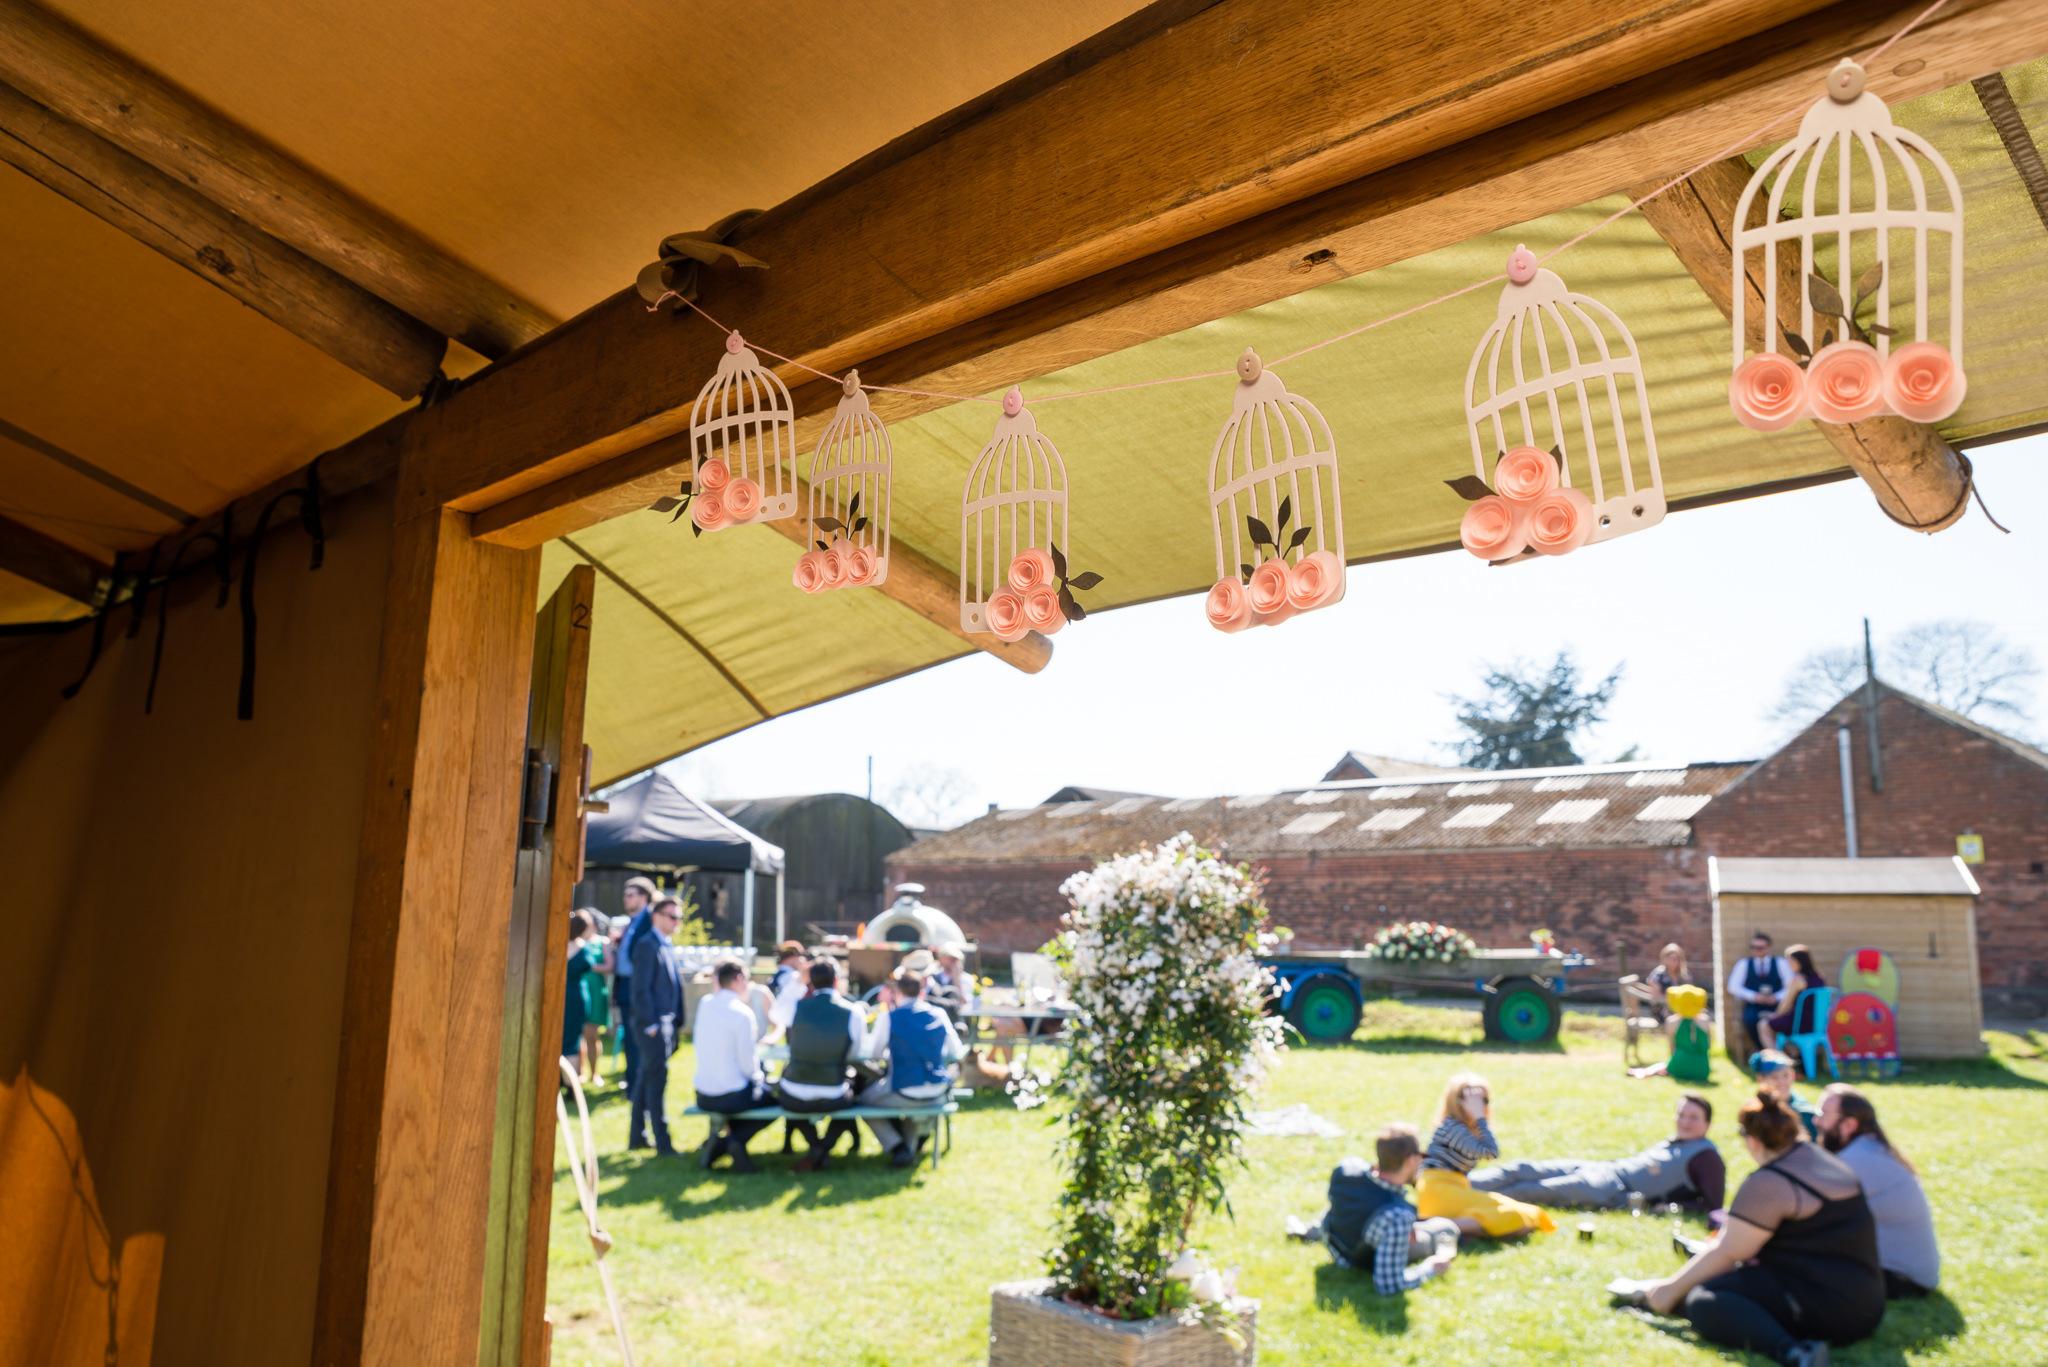 Tipi wedding at woodoaks farm in Rickmansworth